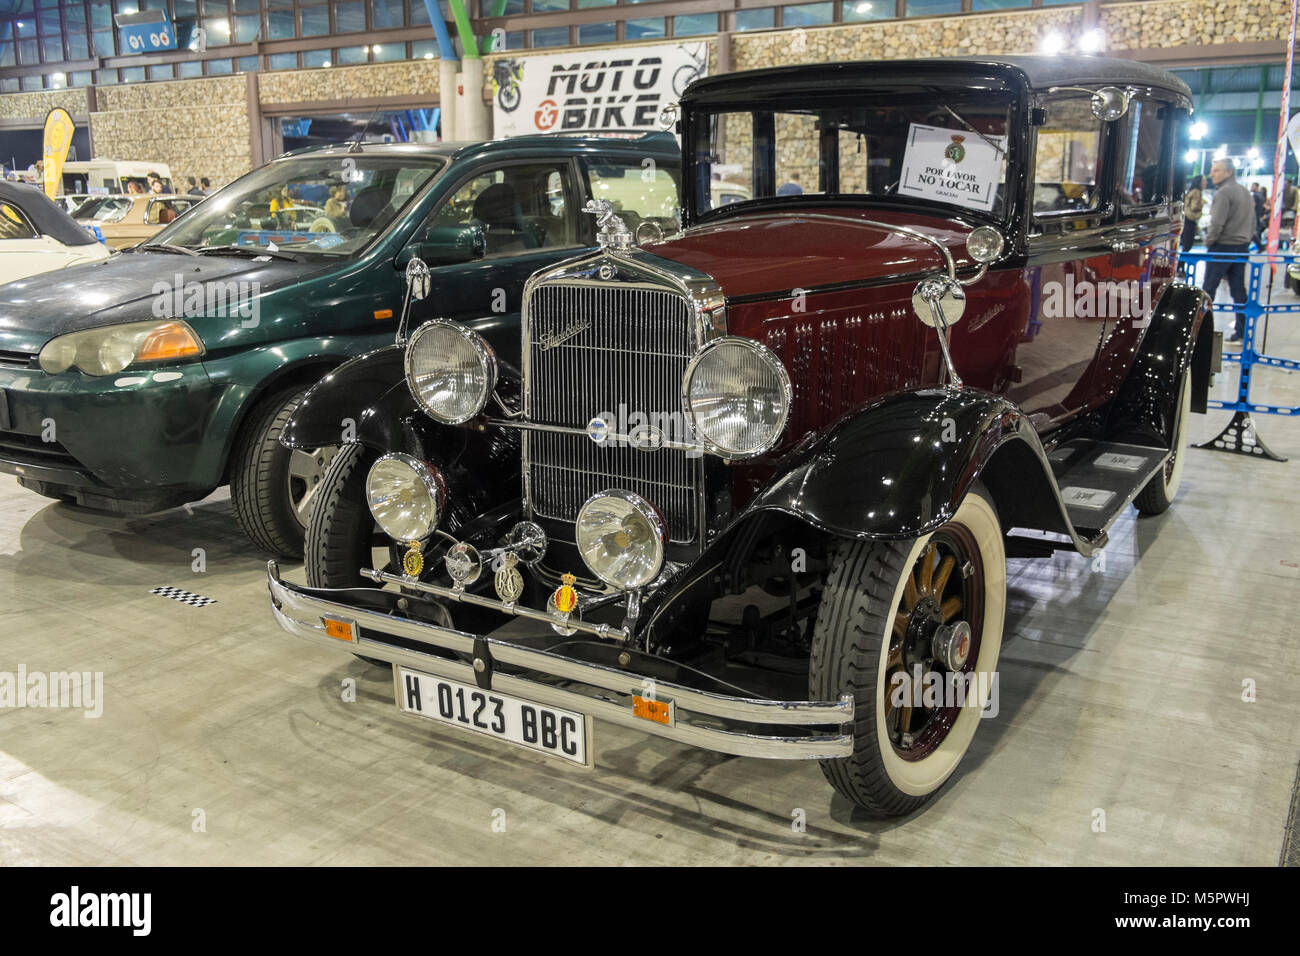 Studebaker. Retro Málaga 2018. Spain. - Stock Image